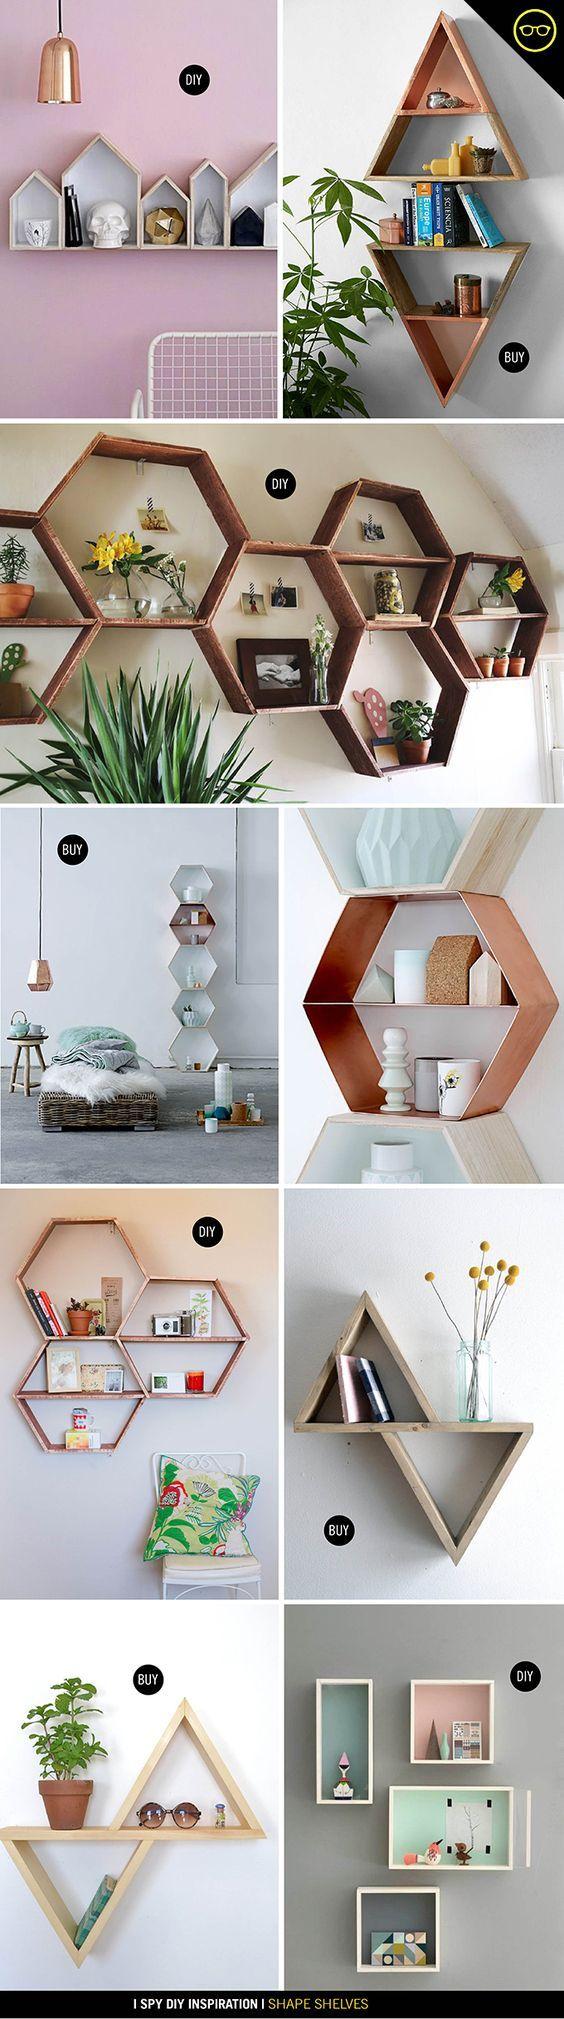 Home Decor Shelf Ideas Part - 49: INSPIRATION | SHAPE SHELVES | I SPY DIY: Diy Storage ShelvesHome Decor  ShelvesShelving IdeasShelf ...